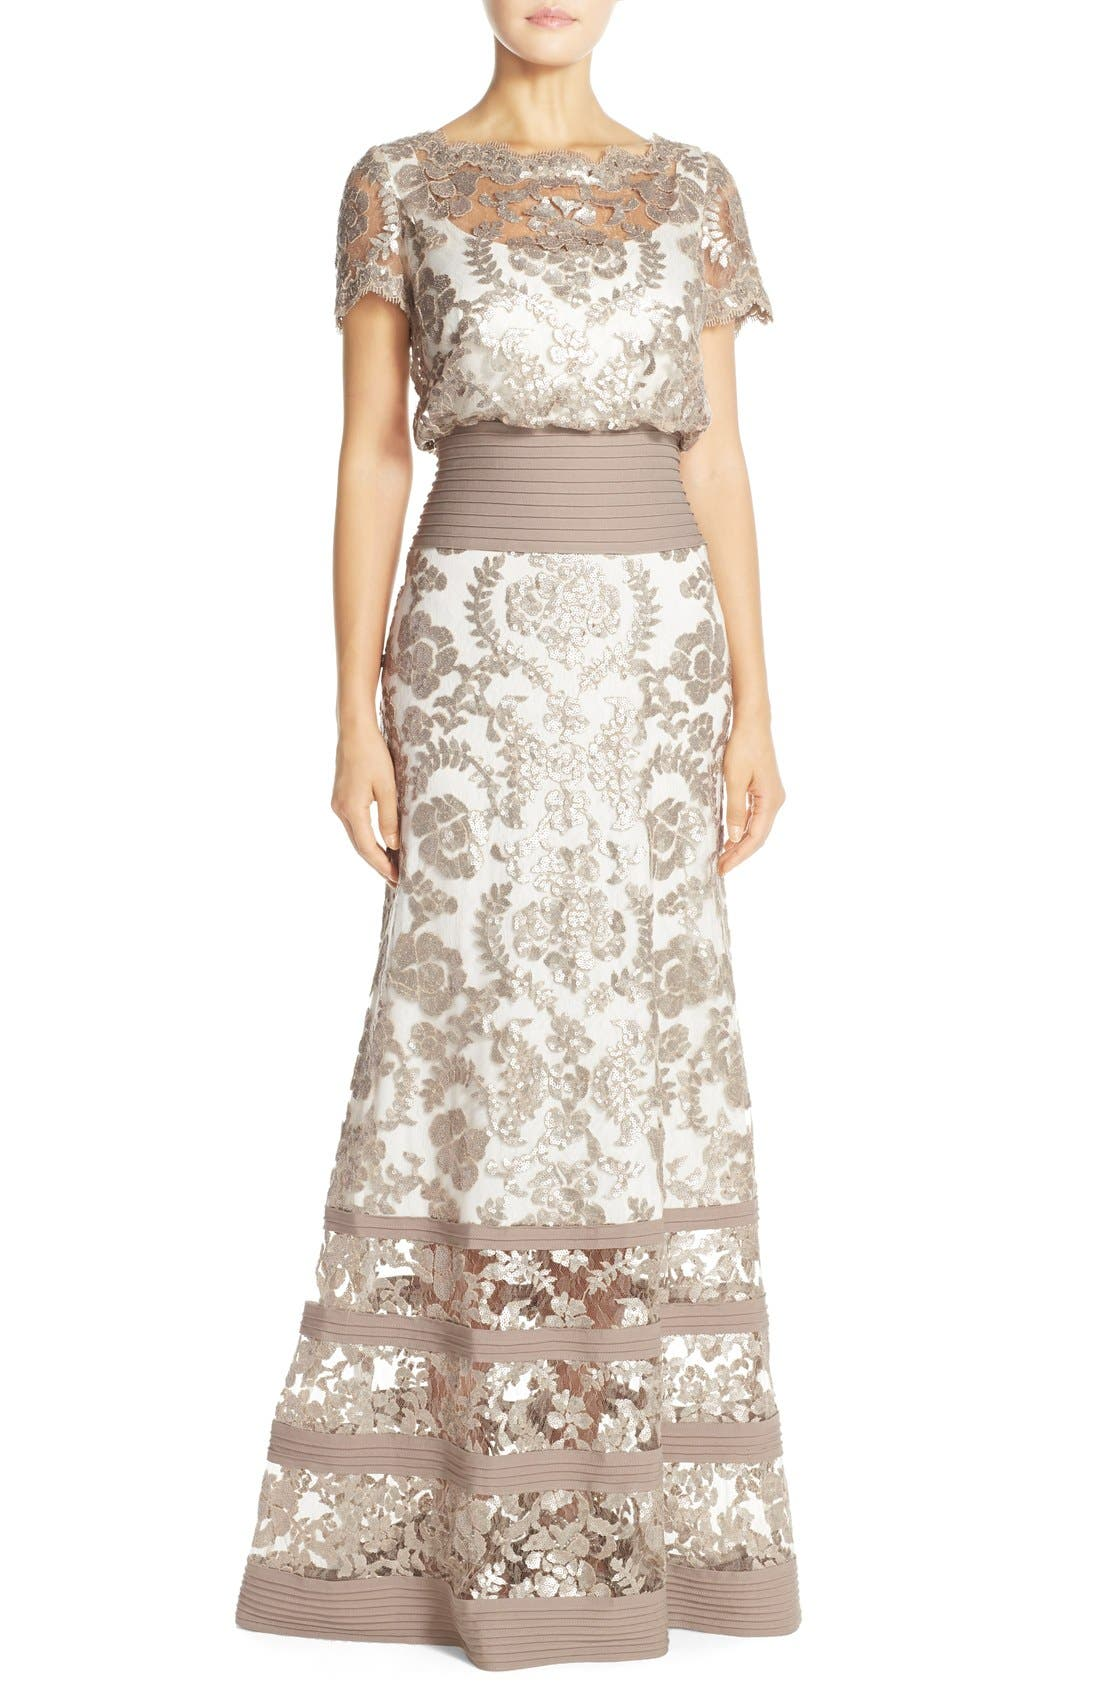 Alternate Image 1 Selected - Tadashi Shoji Sequin Lace Blouson Gown (Regular & Petite)